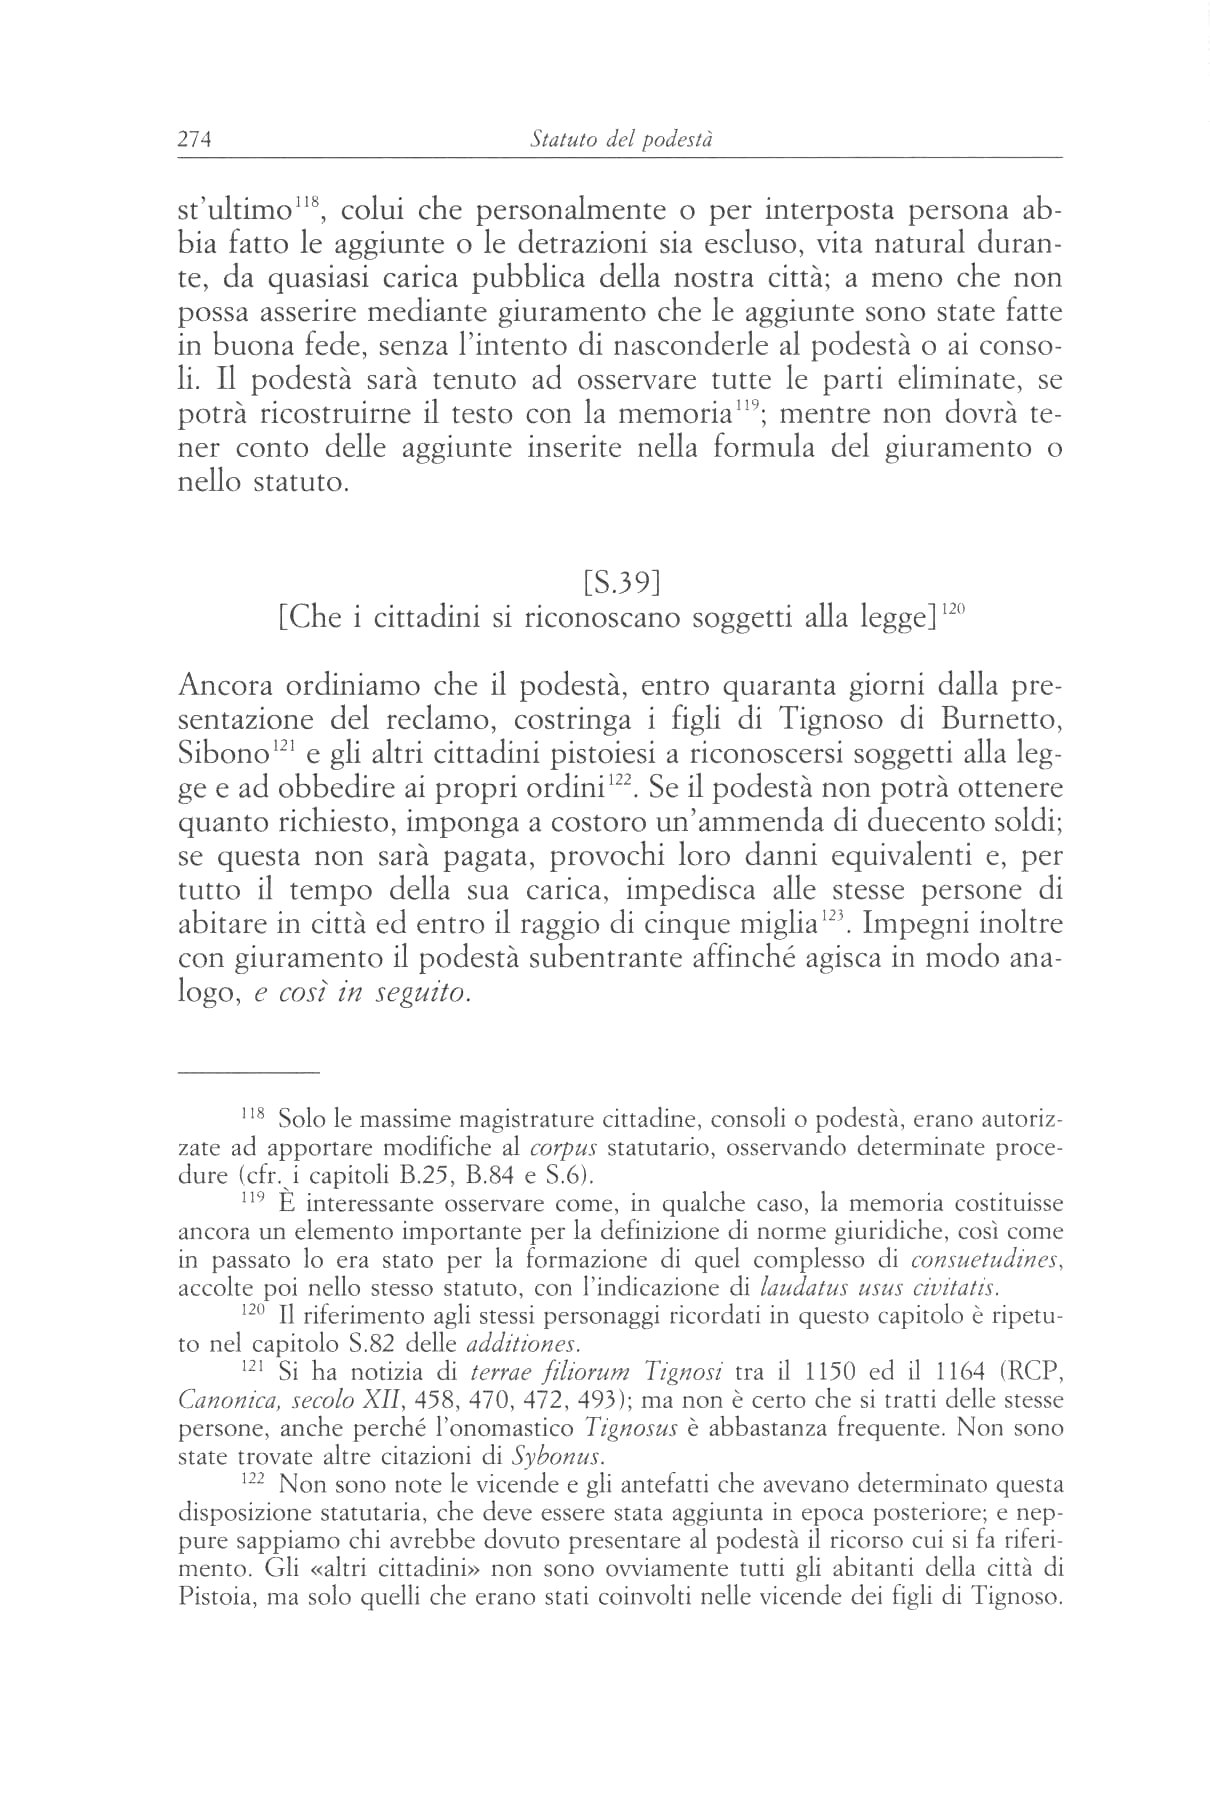 statuti pistoiesi del sec.XII 0274.jpg